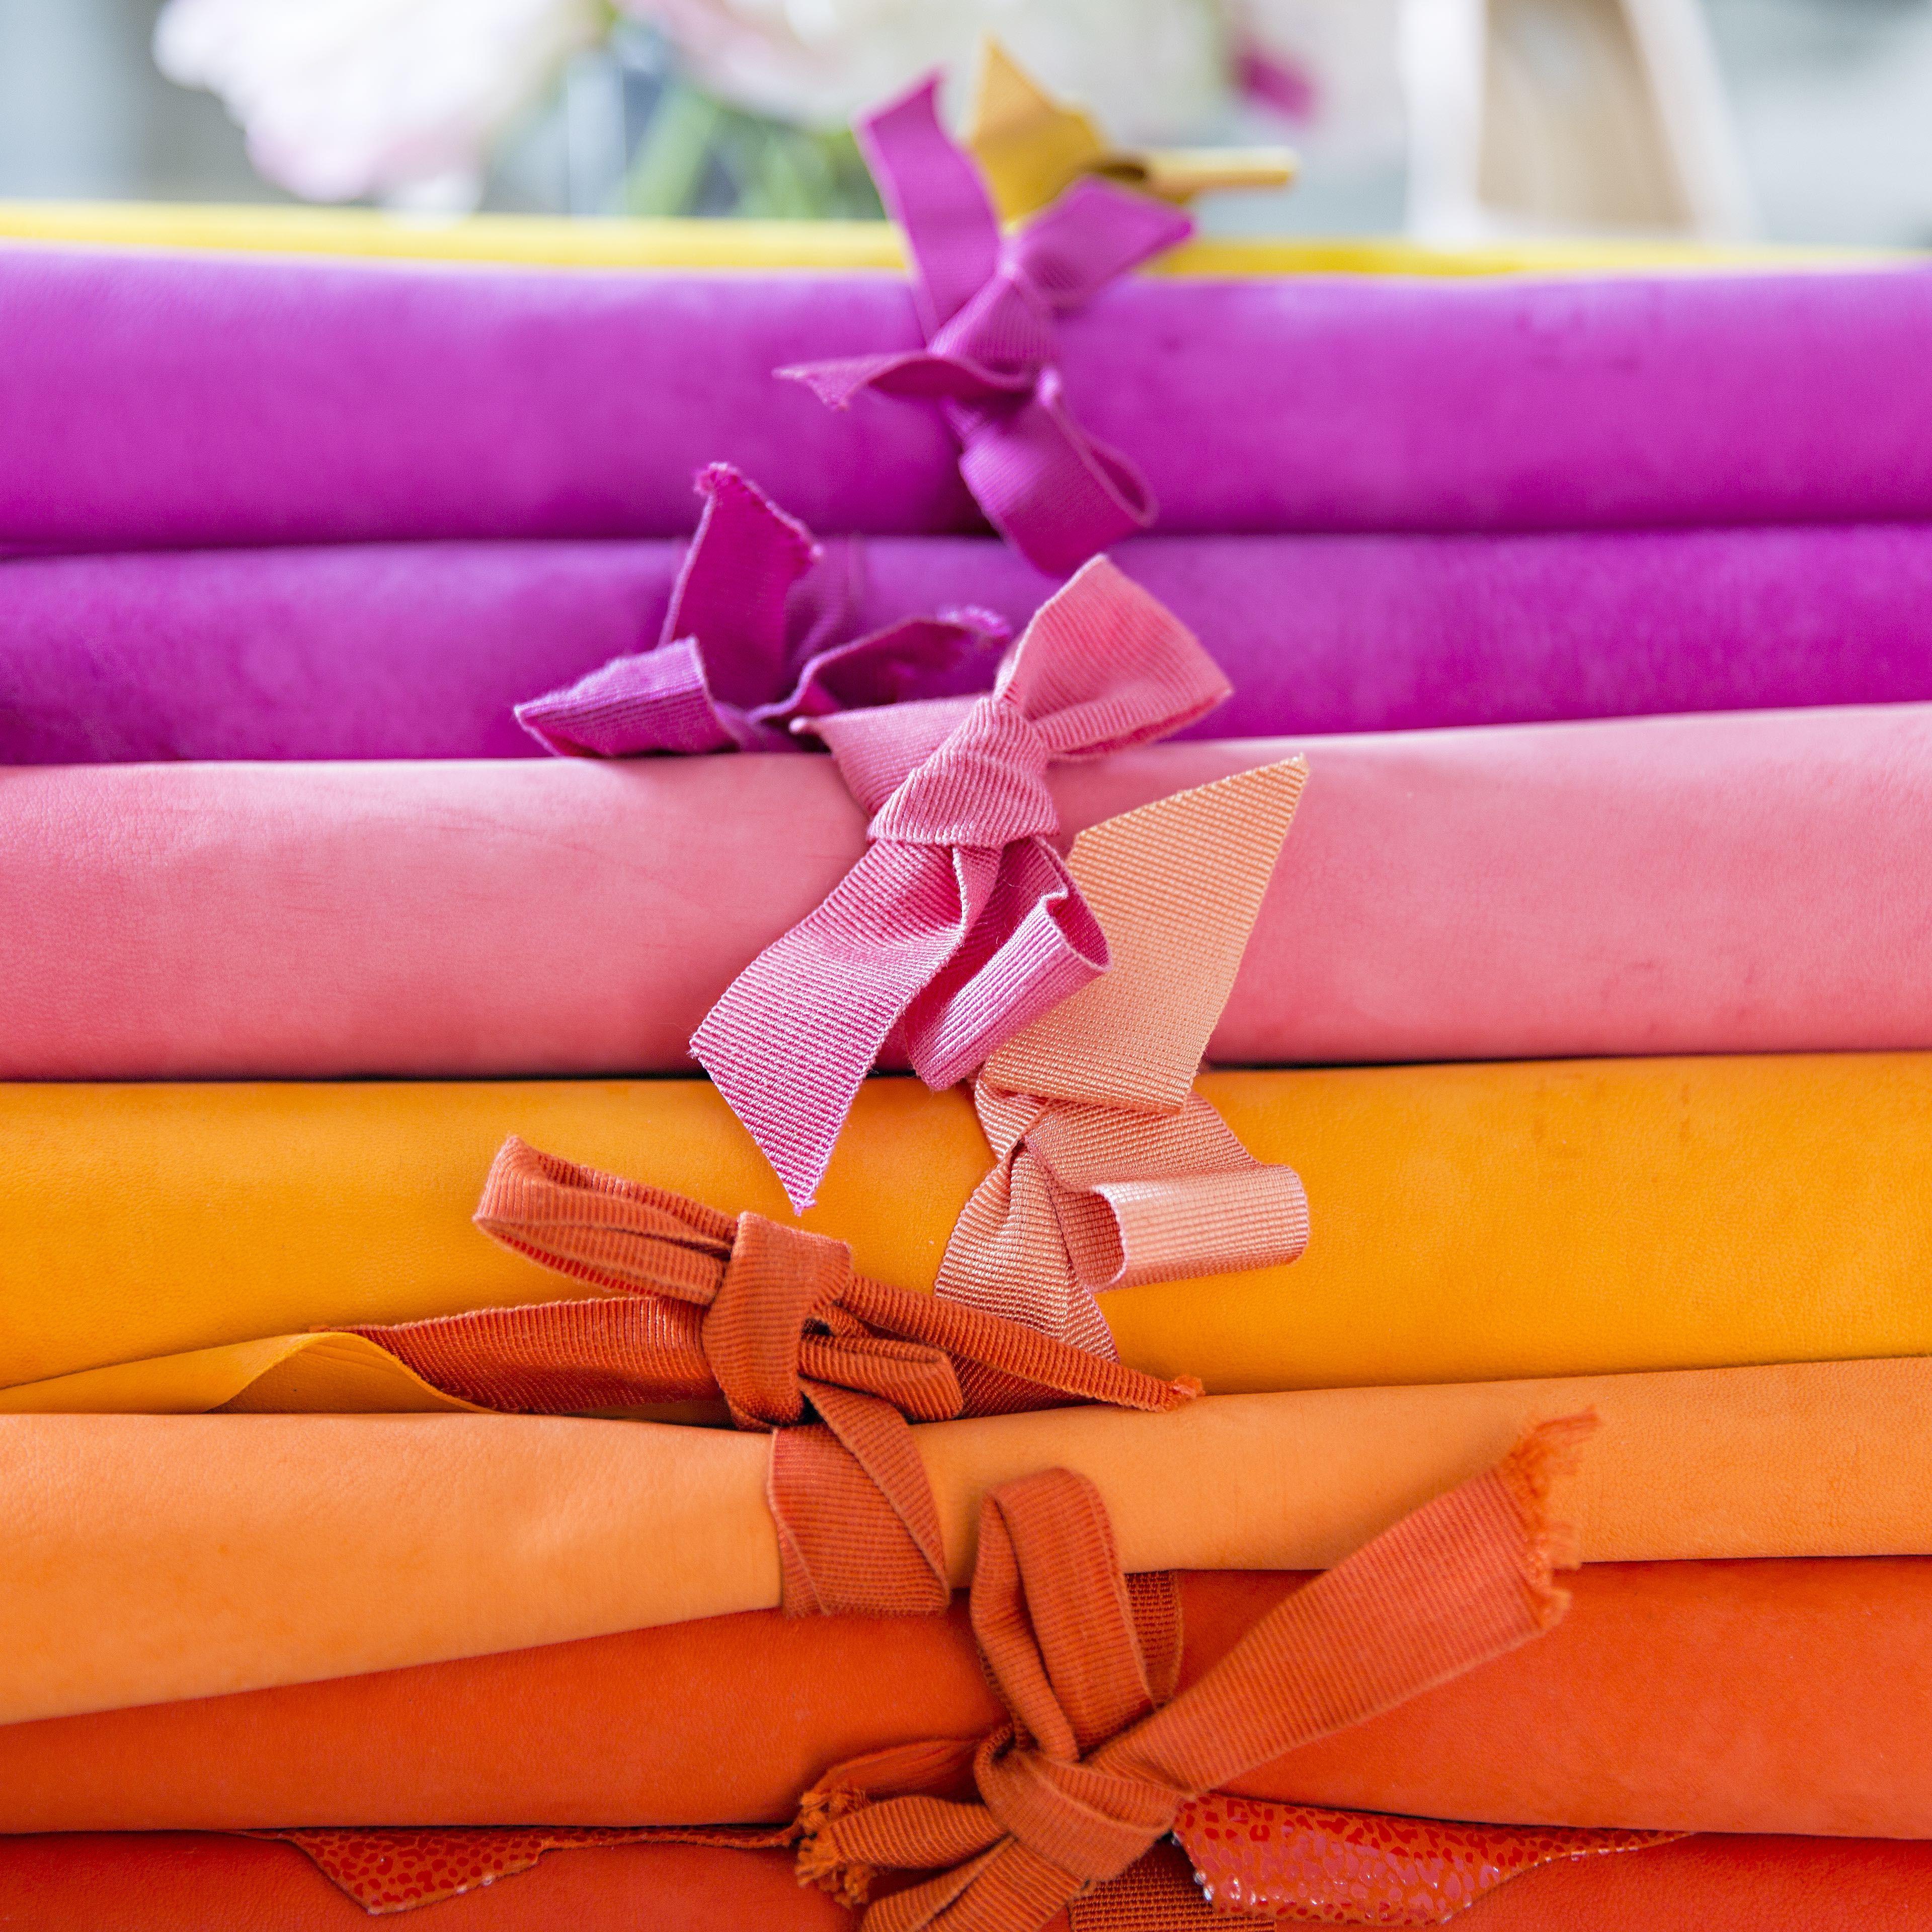 We love color textiles. #handcrafted #Italy   https://viajiyu.com/